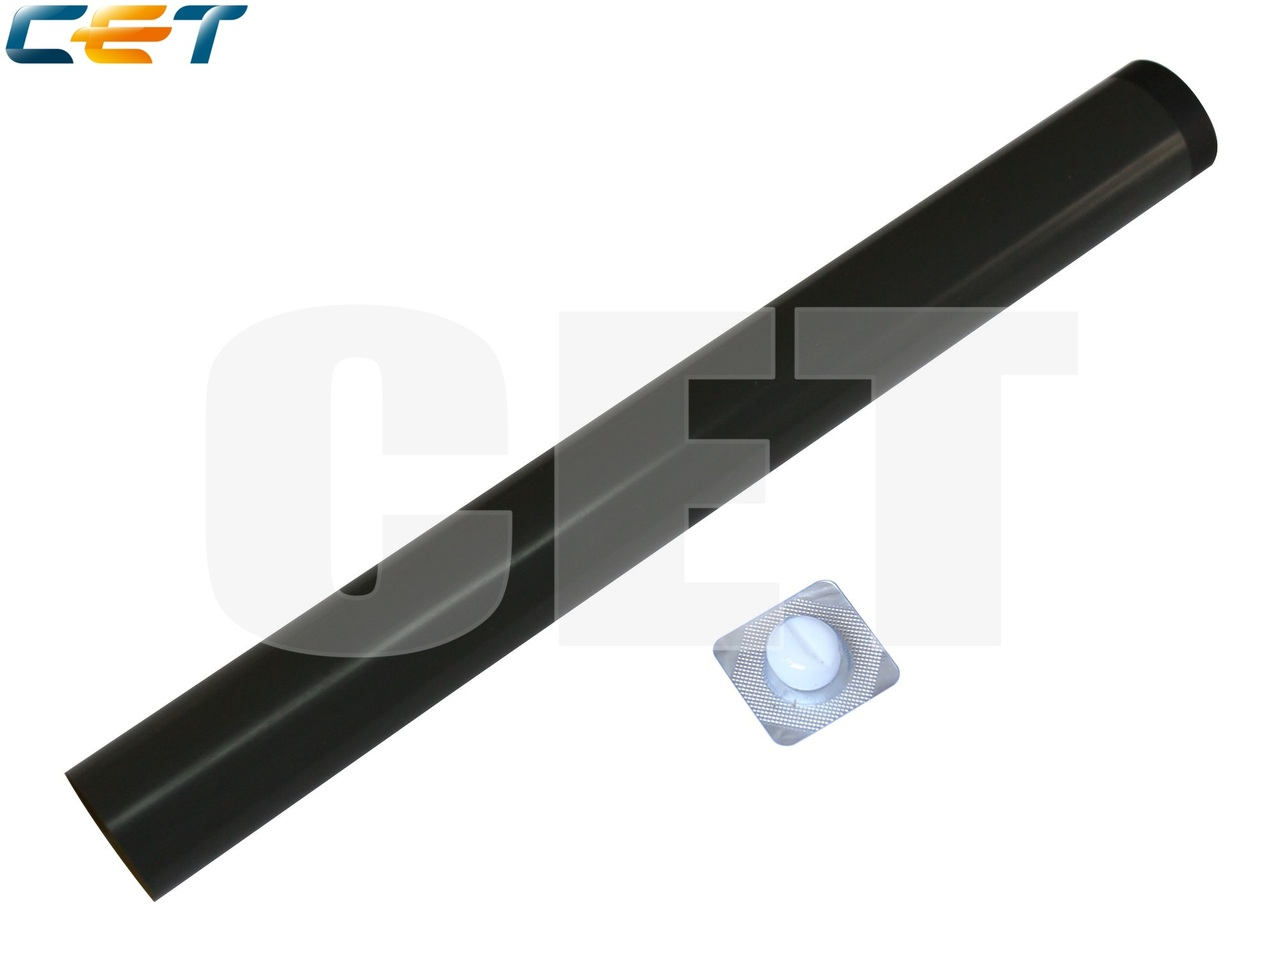 Термопленка для HP LaserJet 2420/2430/P3005 (CET),CET1463